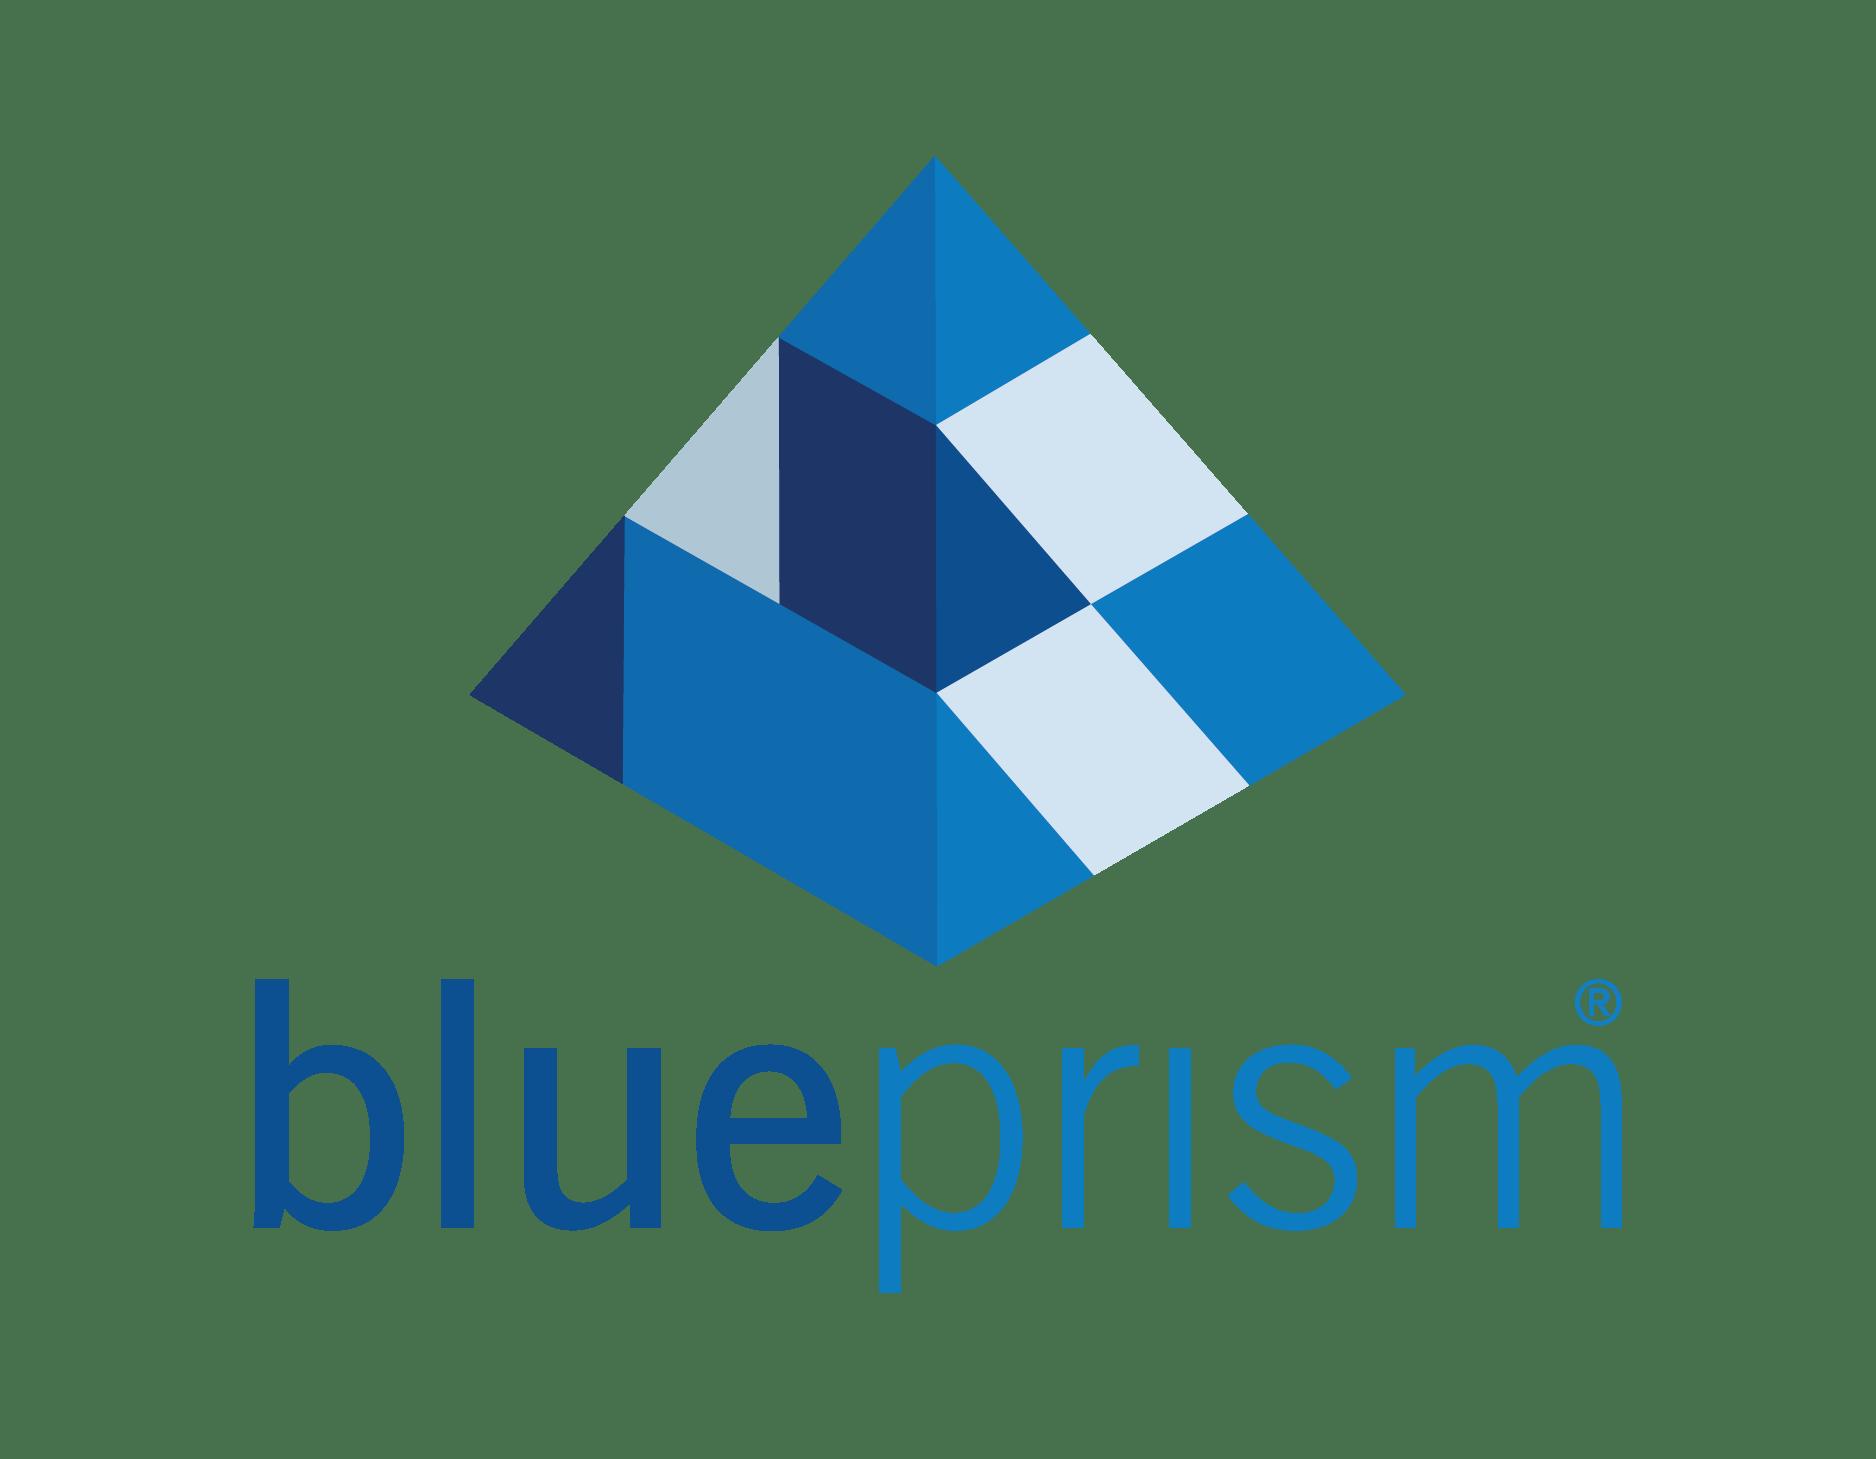 Blueprism logo